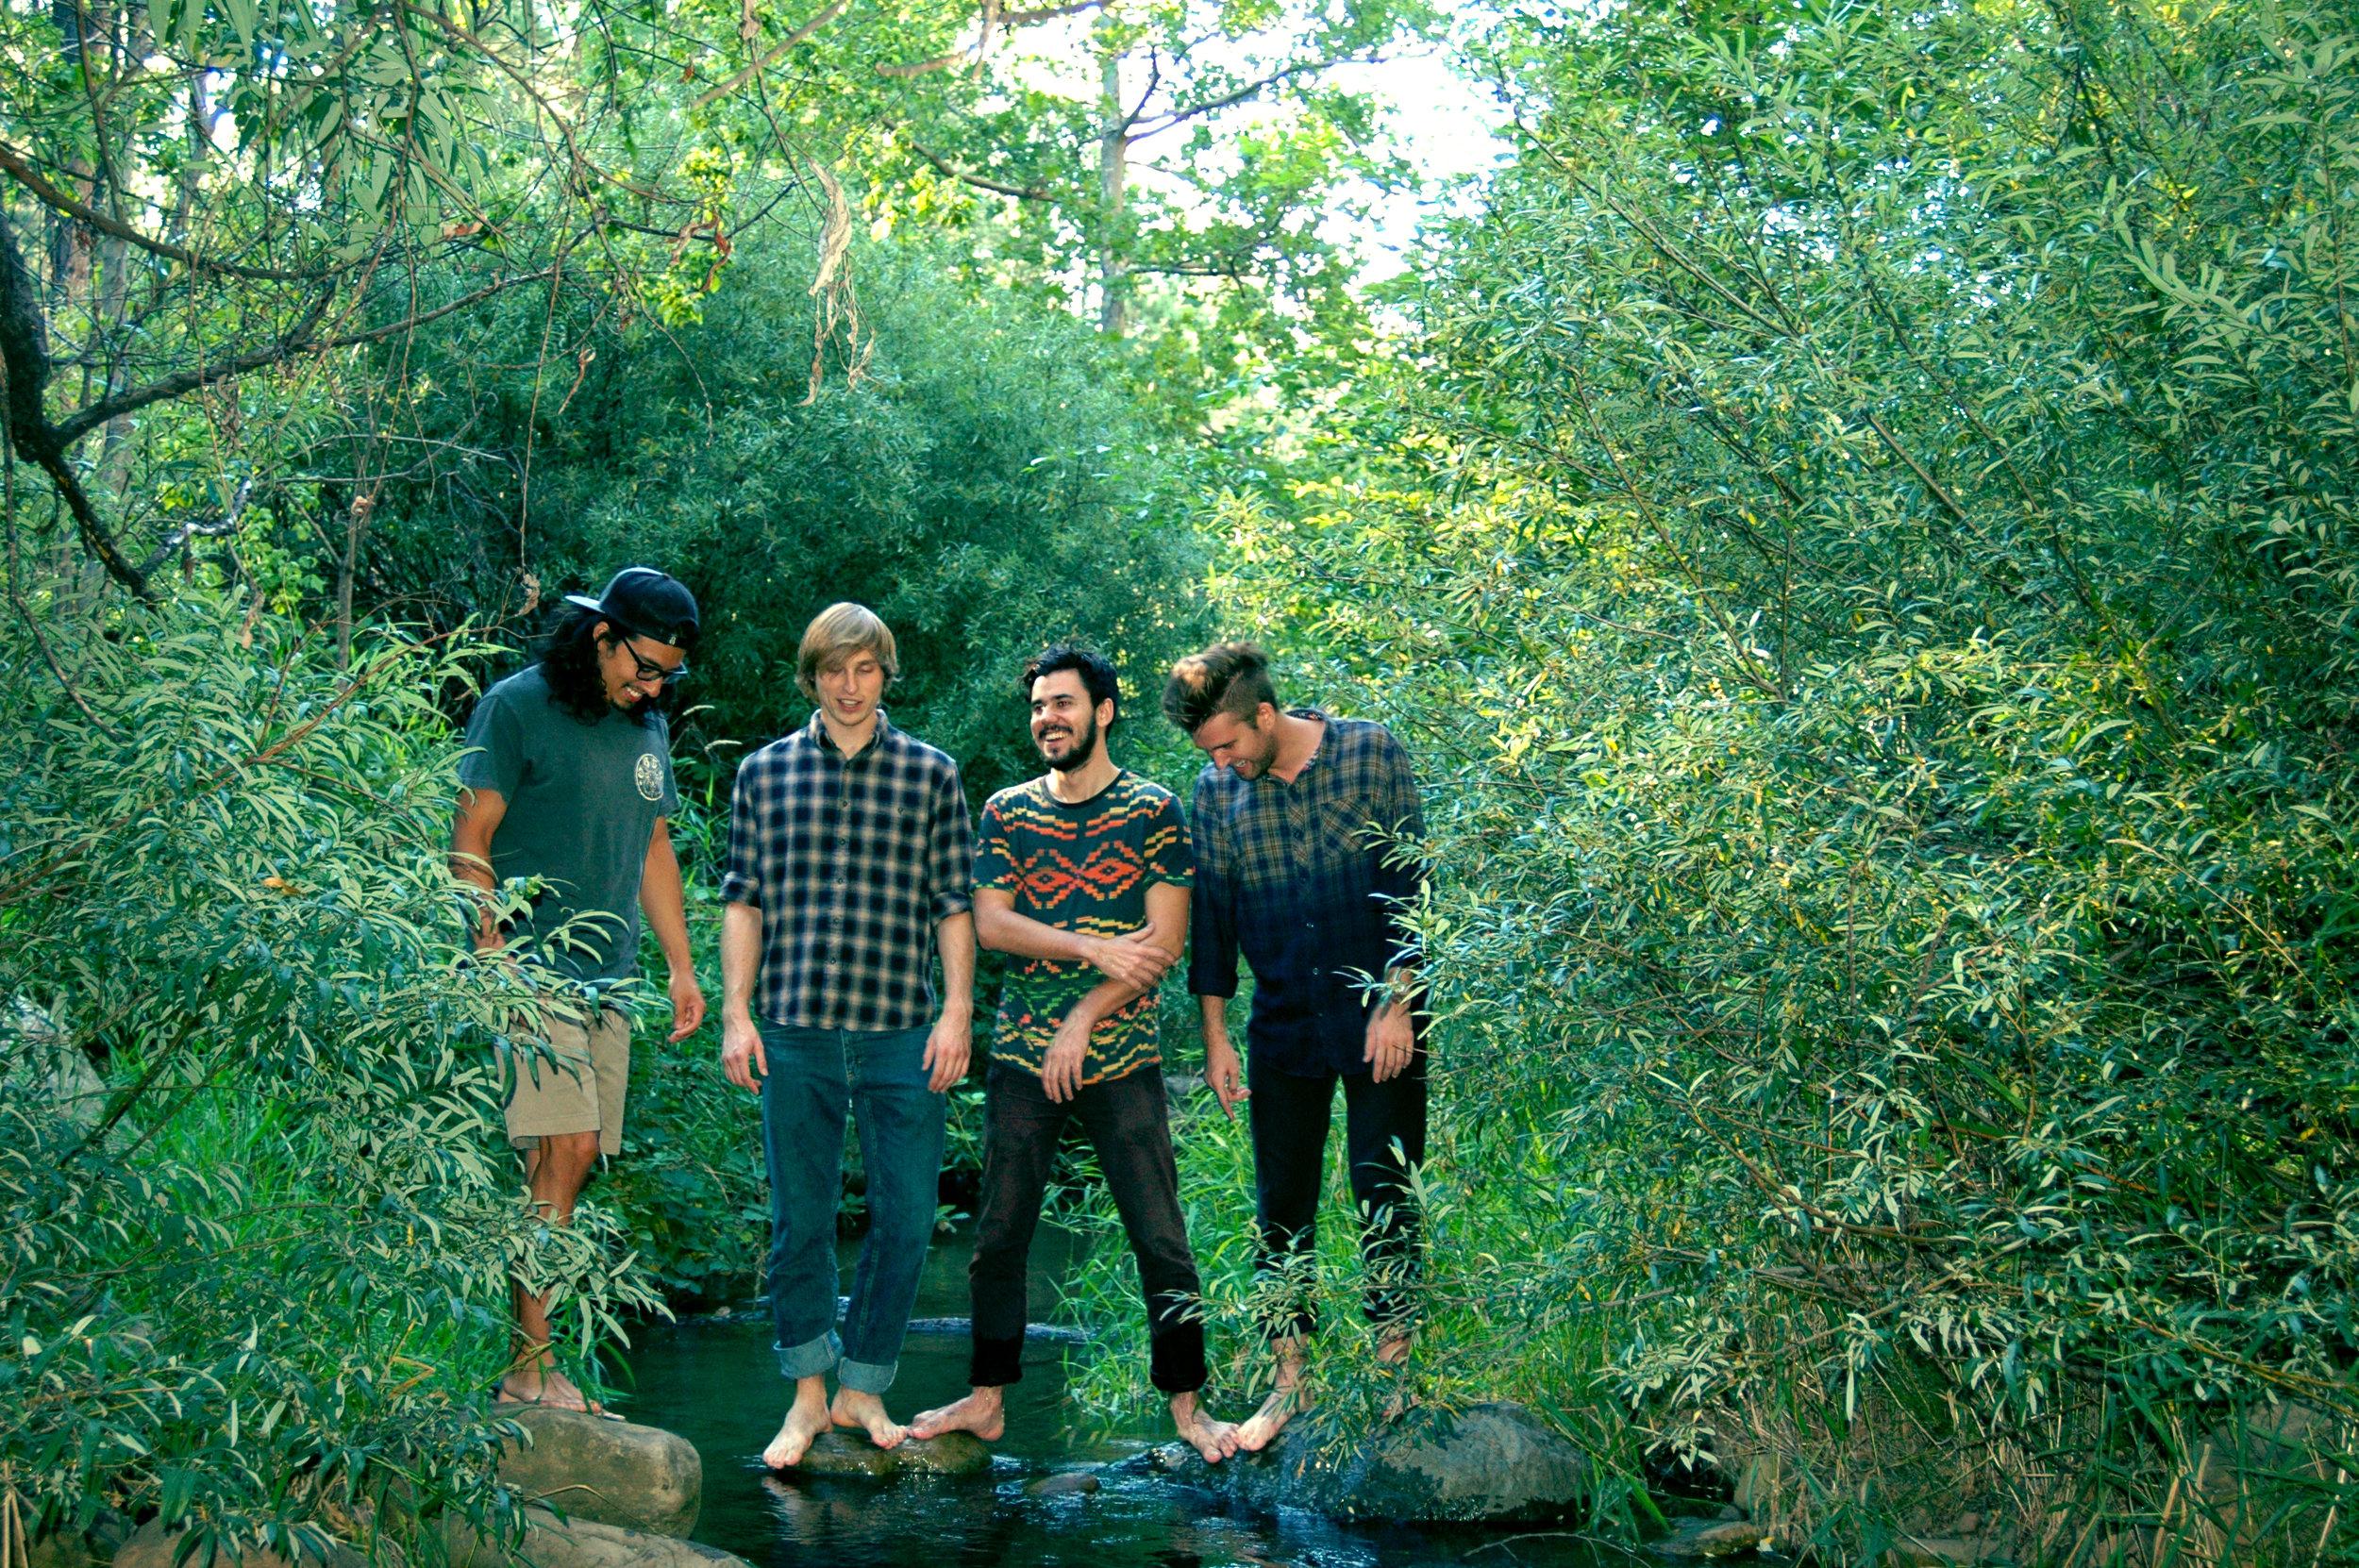 barefoot music promo barefoot band 1 phoenix arizona.jpg